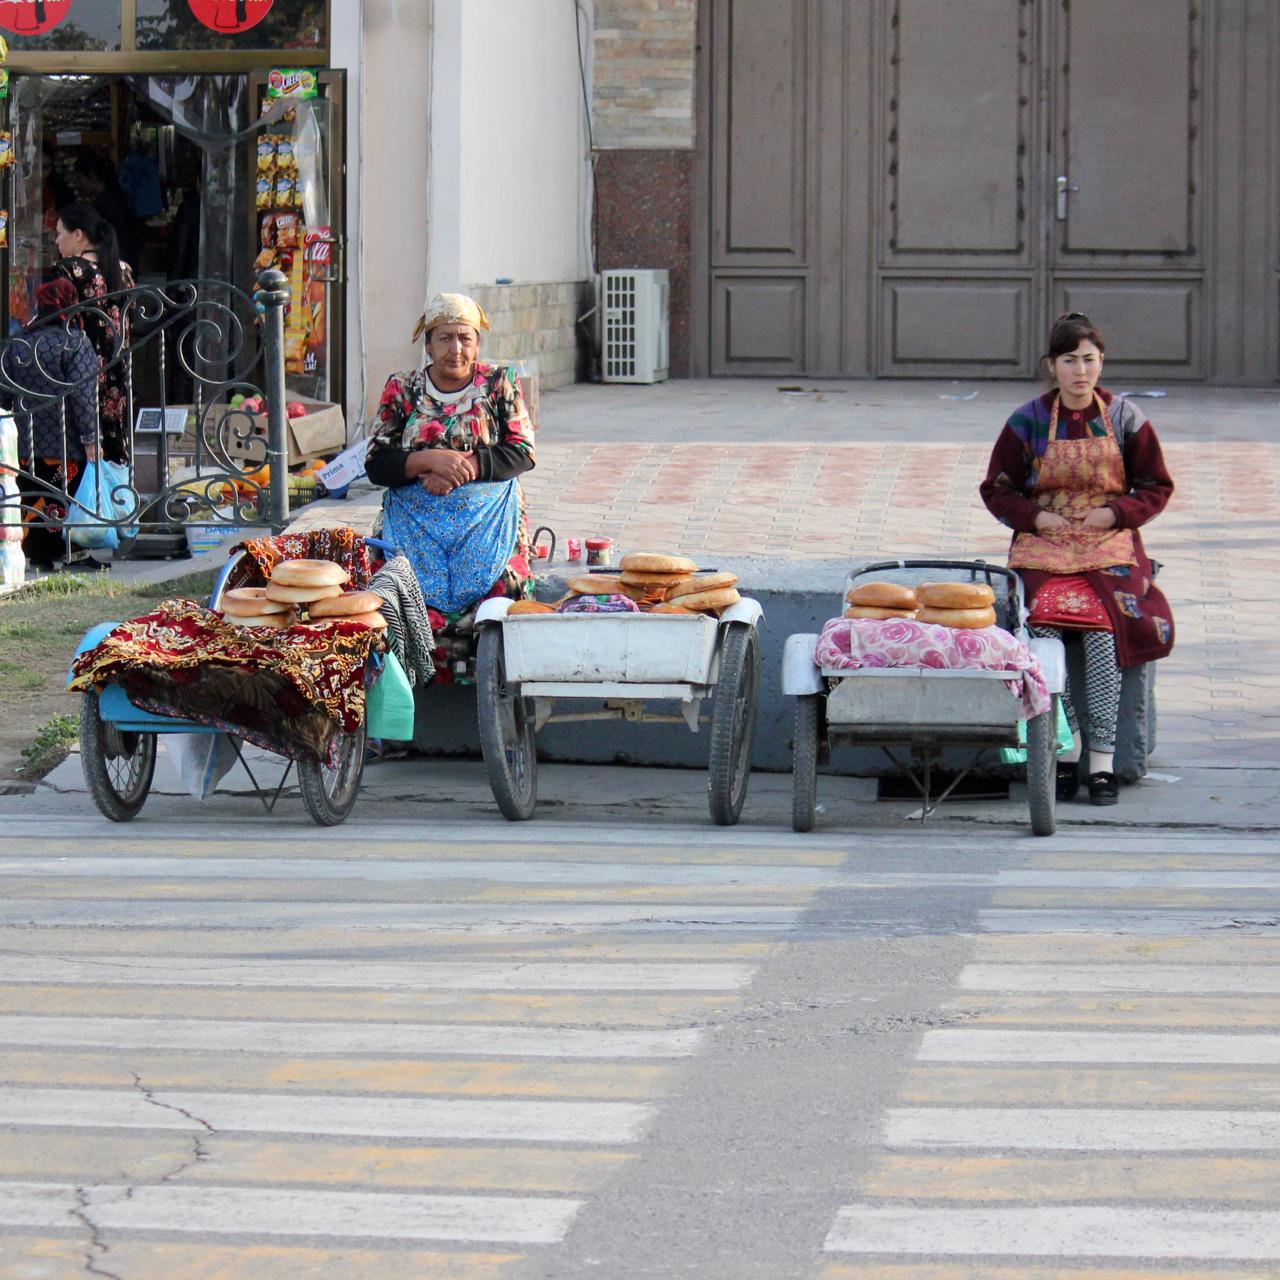 samarkand, uzbekistan - 21